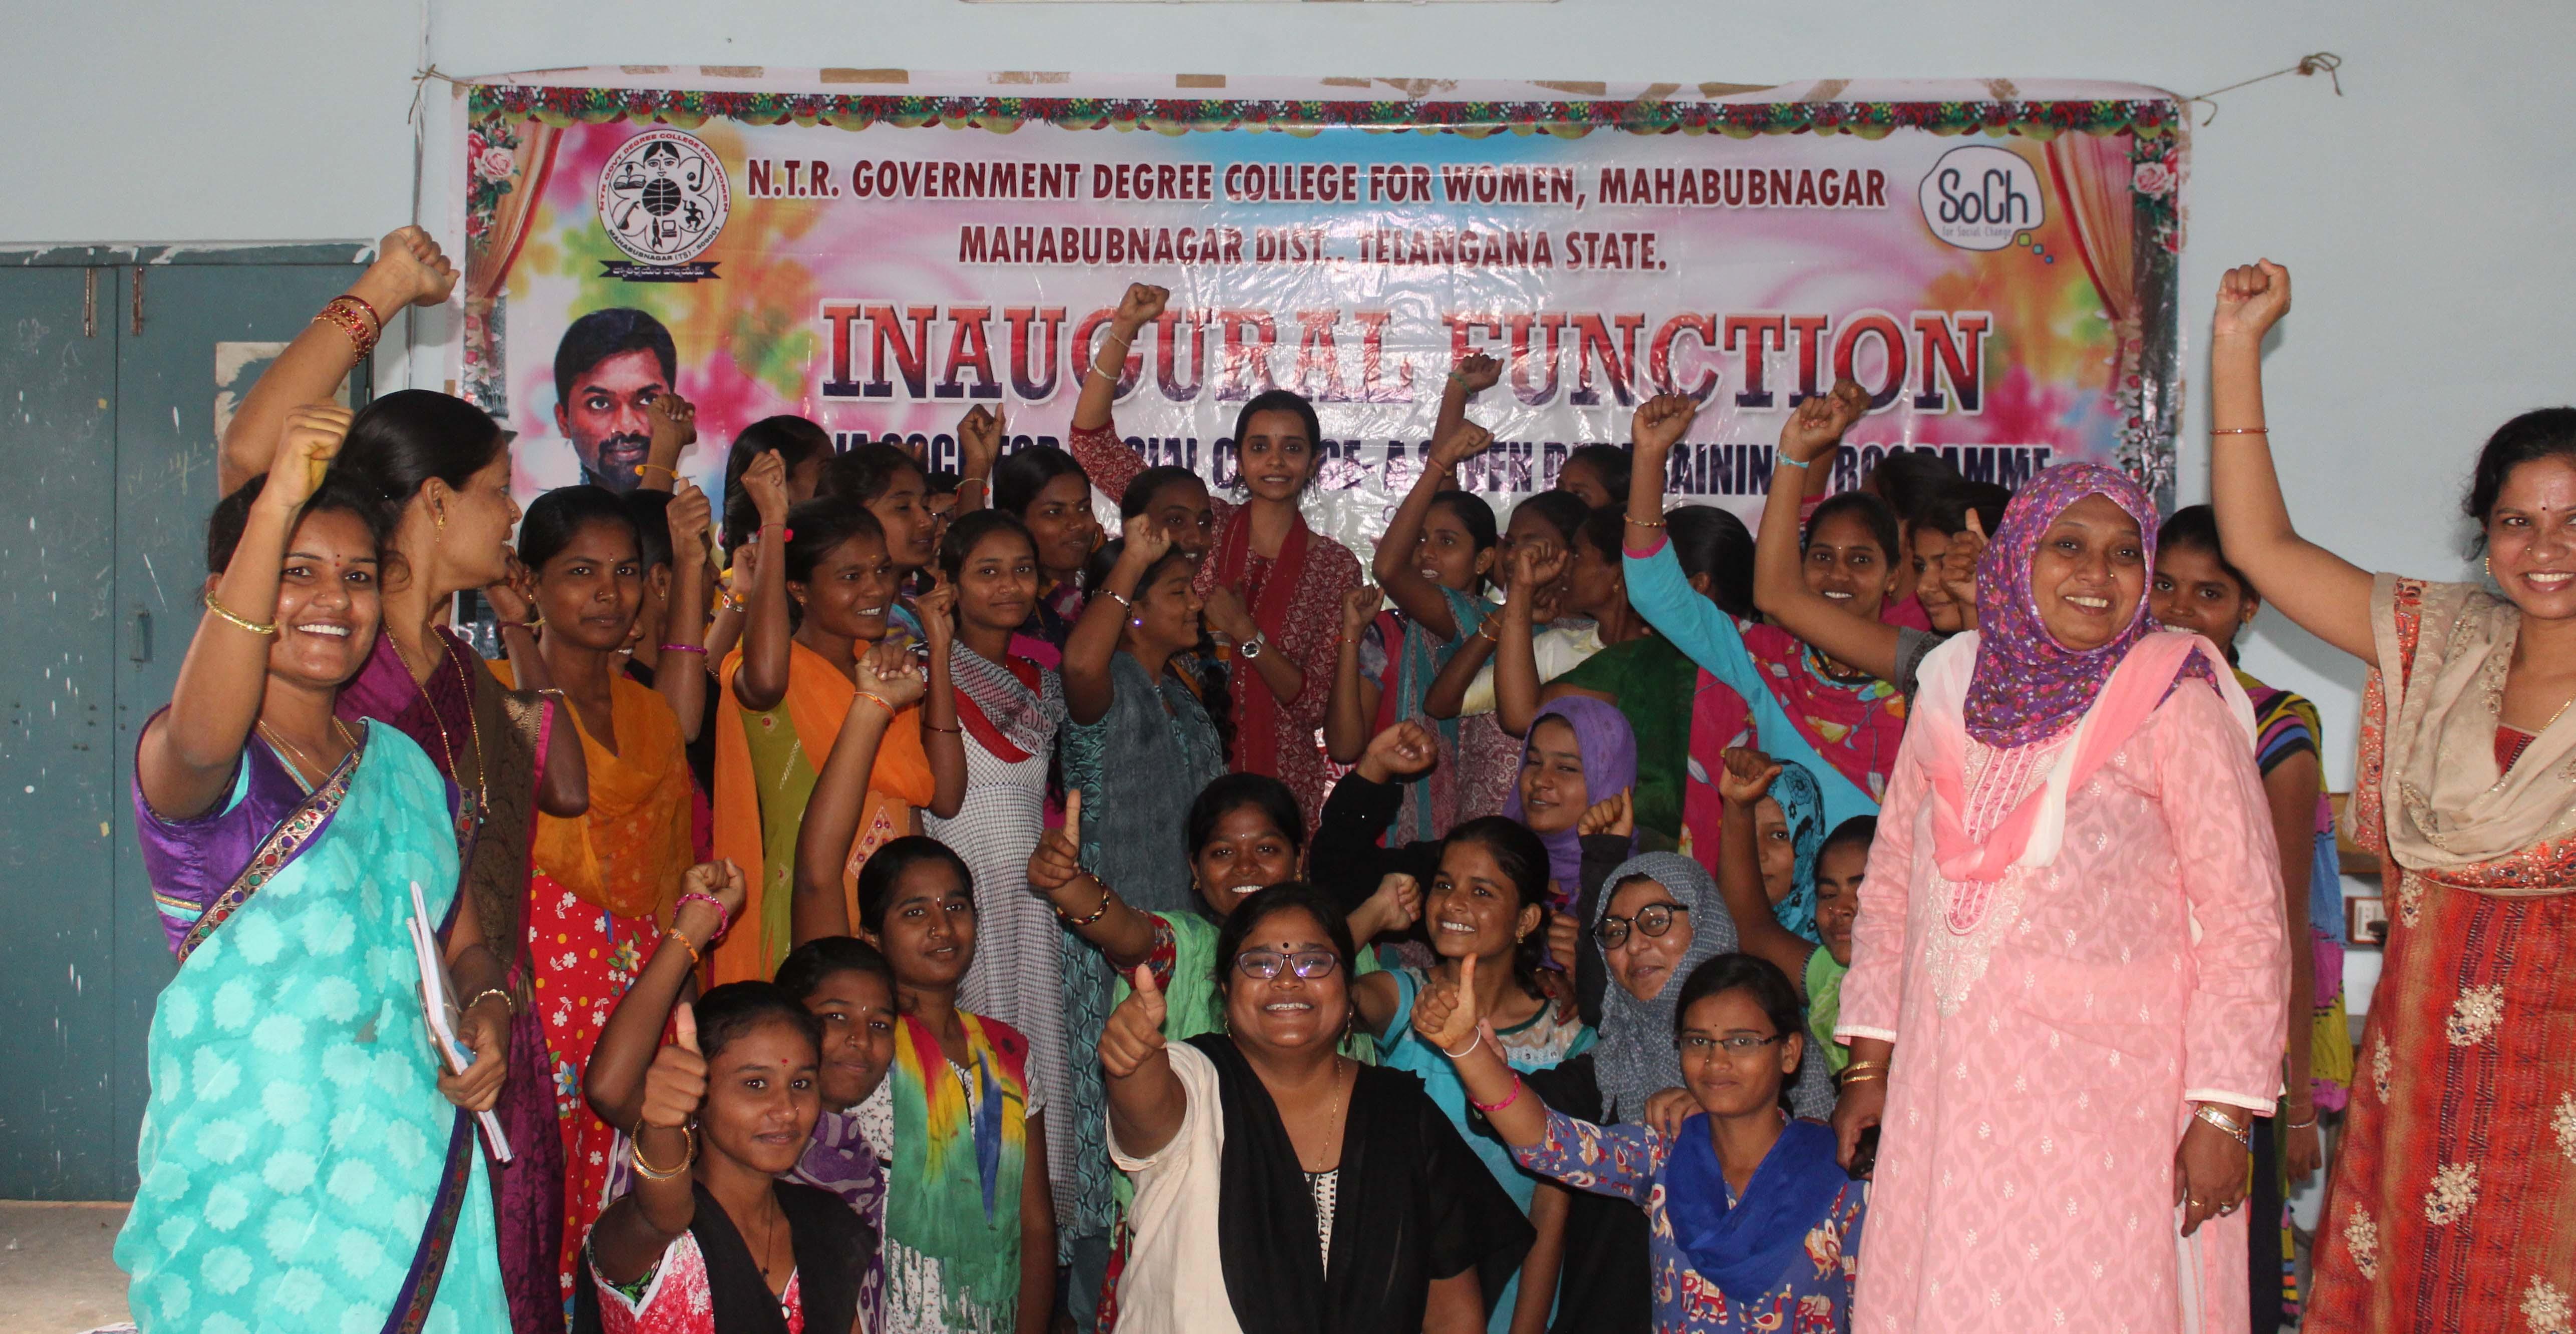 NTR Government Degree College for Women, Mahabubnagar